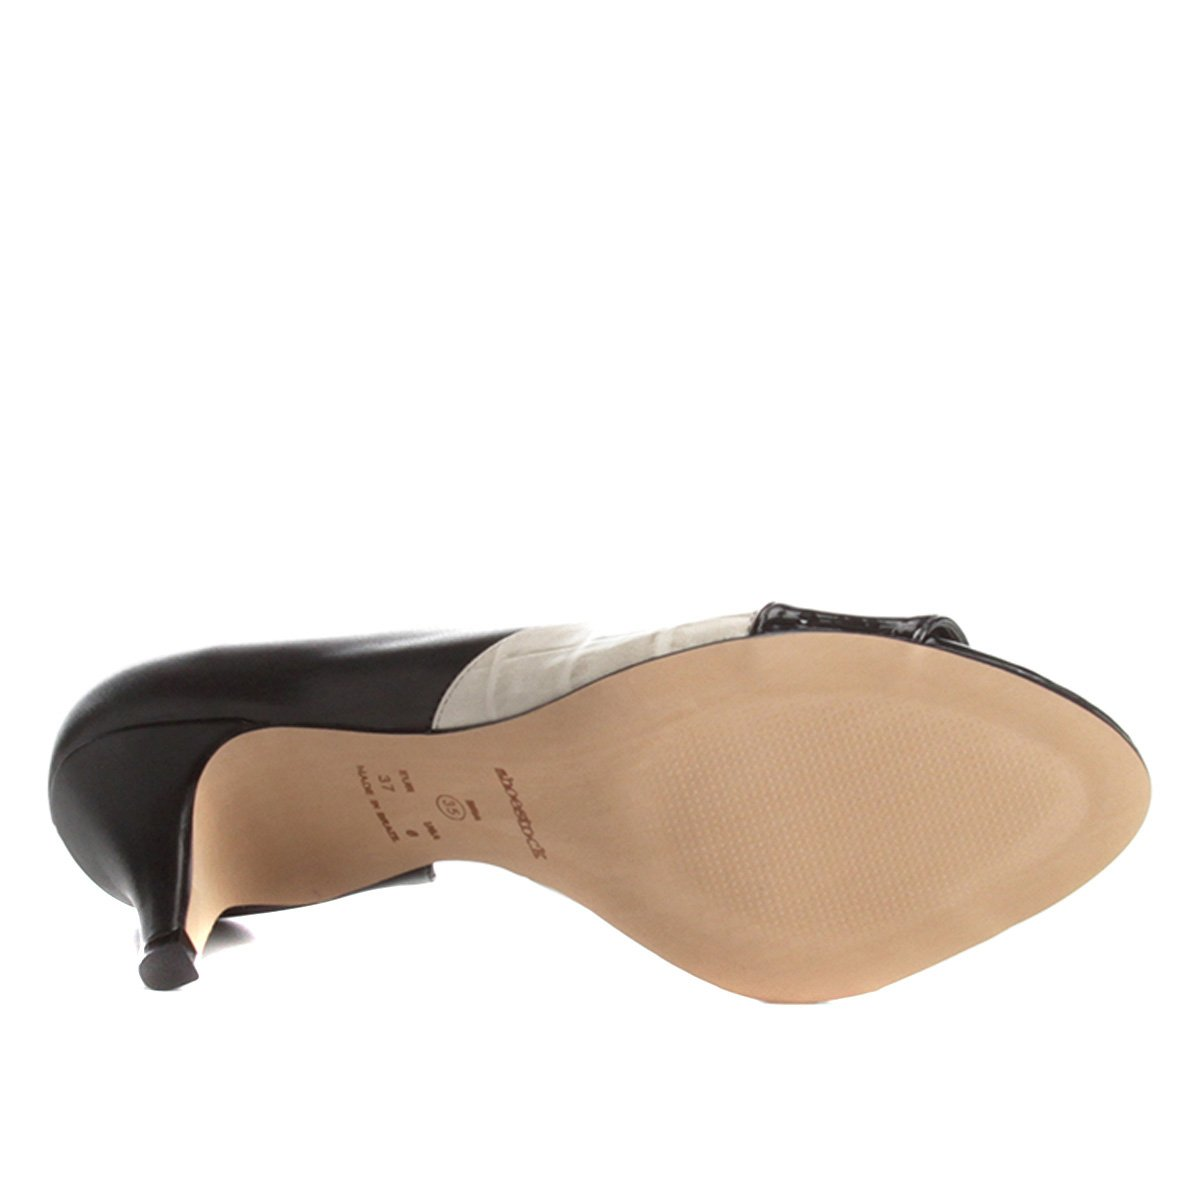 Texturas White Salto Shoestock Peep e Off Médio Toe Preto wxAgn1nq7Z